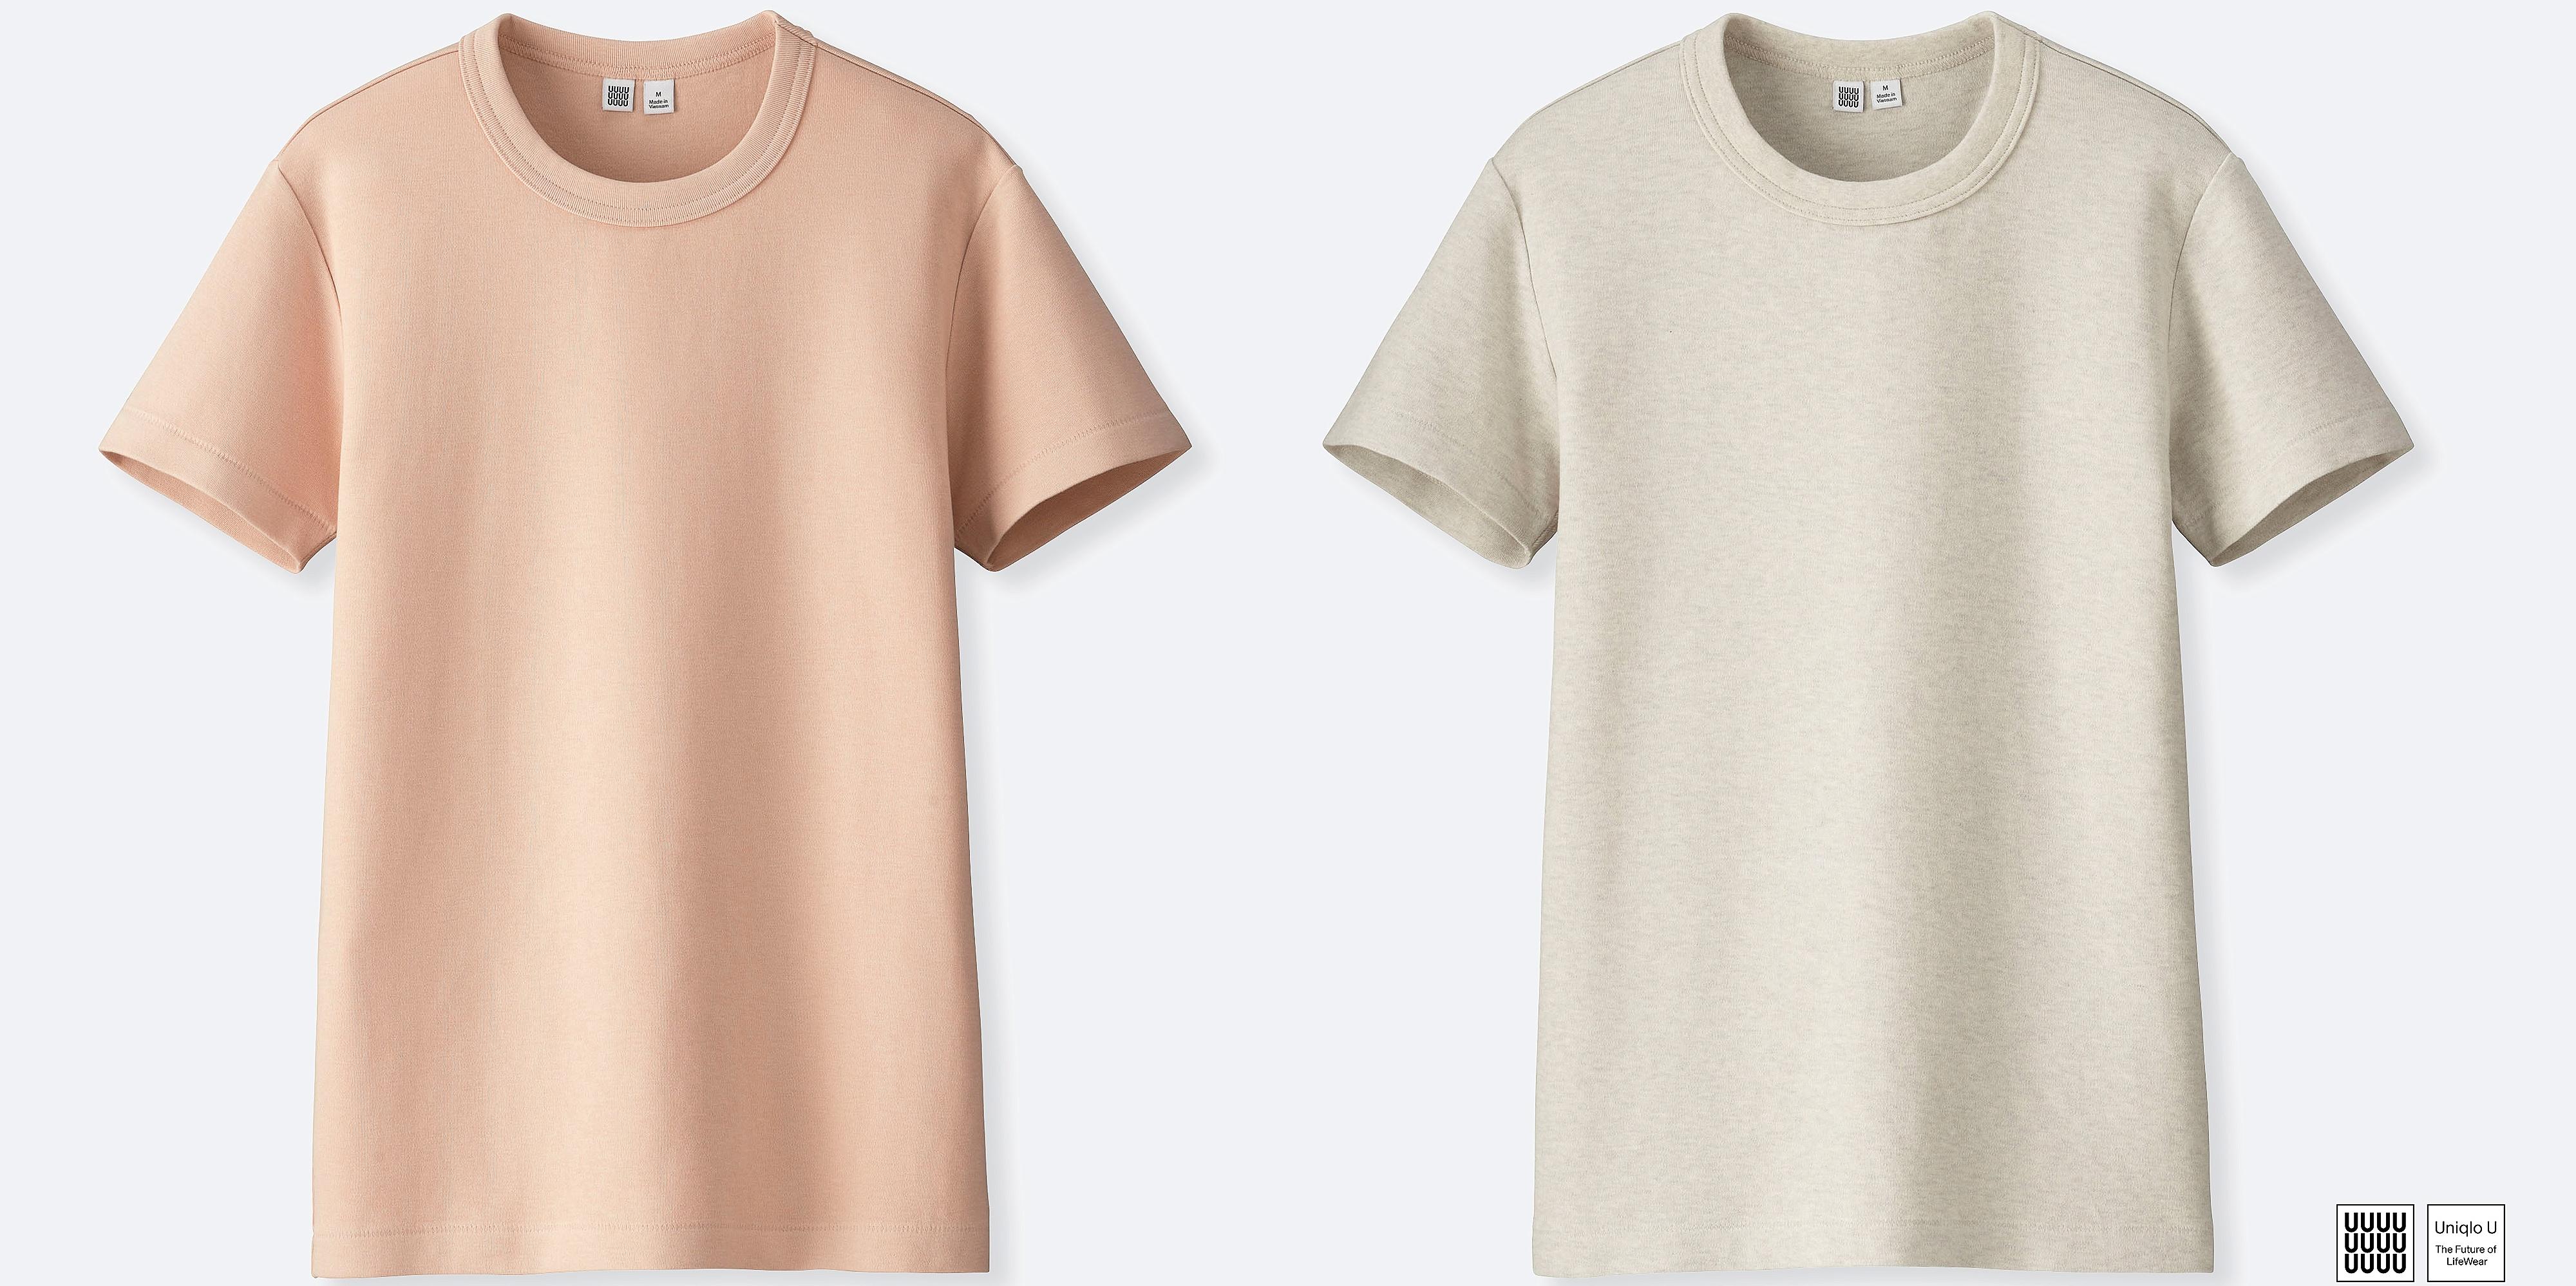 6d3002882 2017 UNIQLO U crew neck short sleeve cotton t-shirt Gray Pink